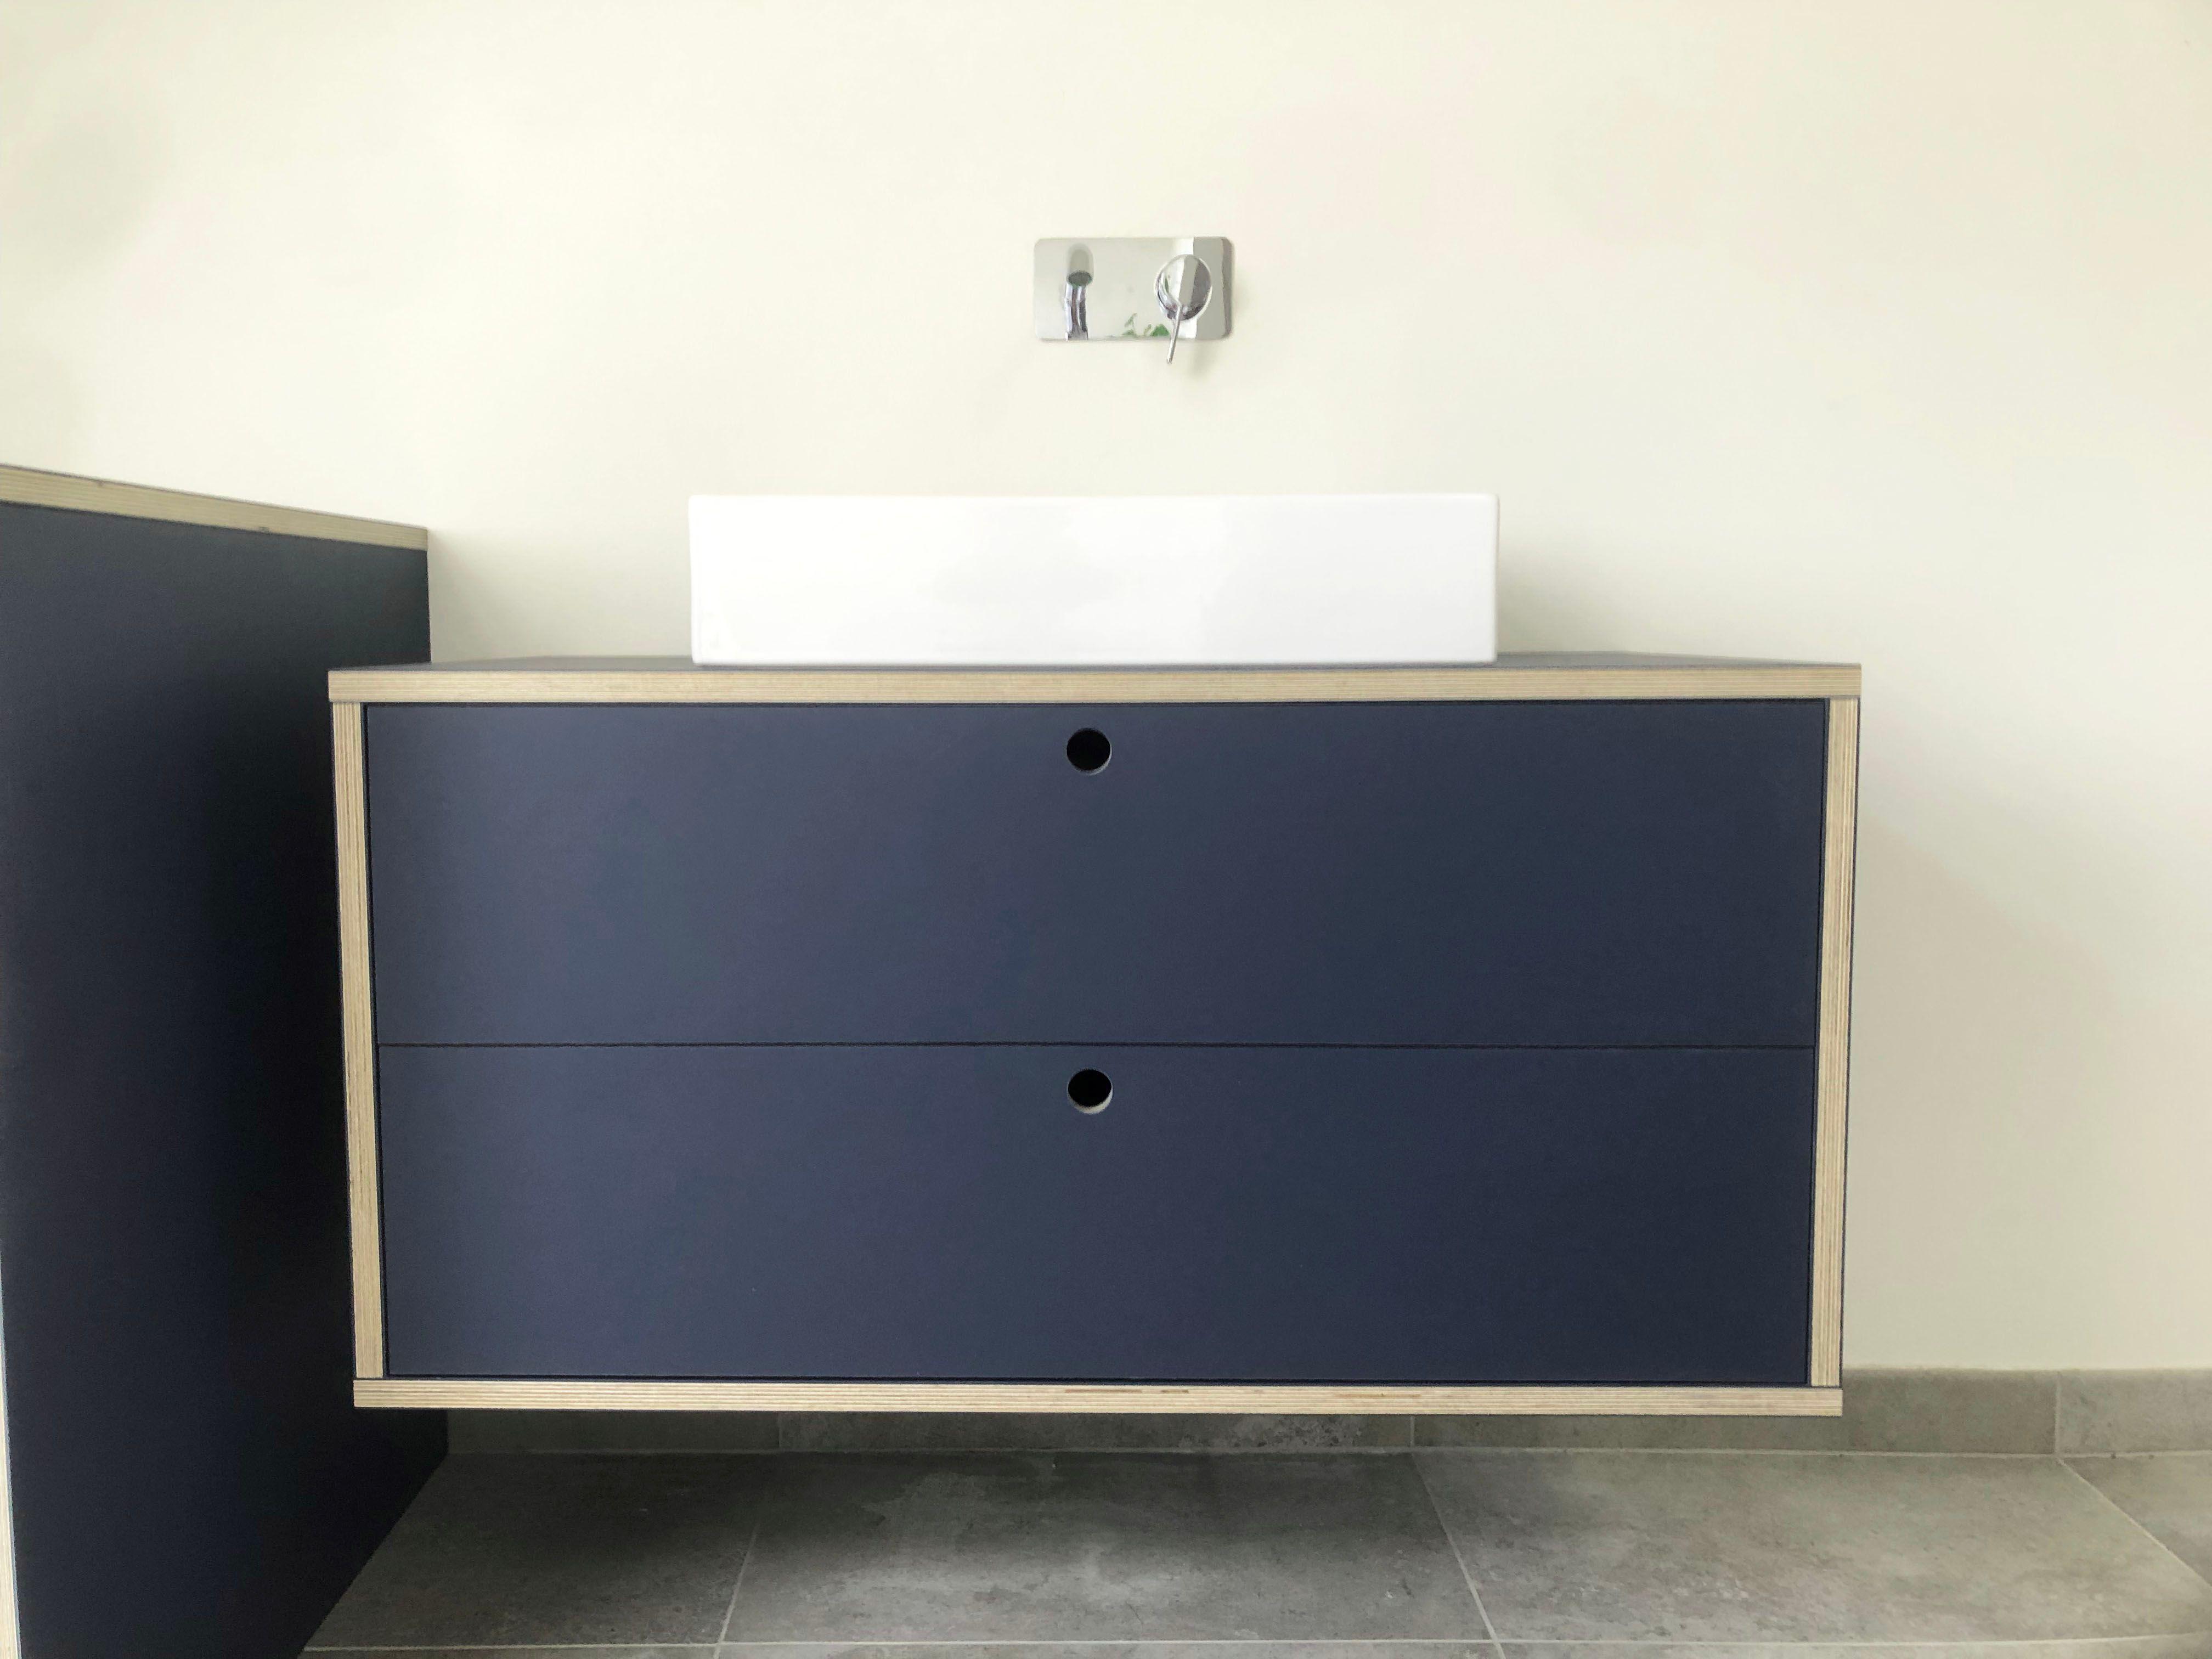 Badeværelsesmøbel, skuffer, linoleum